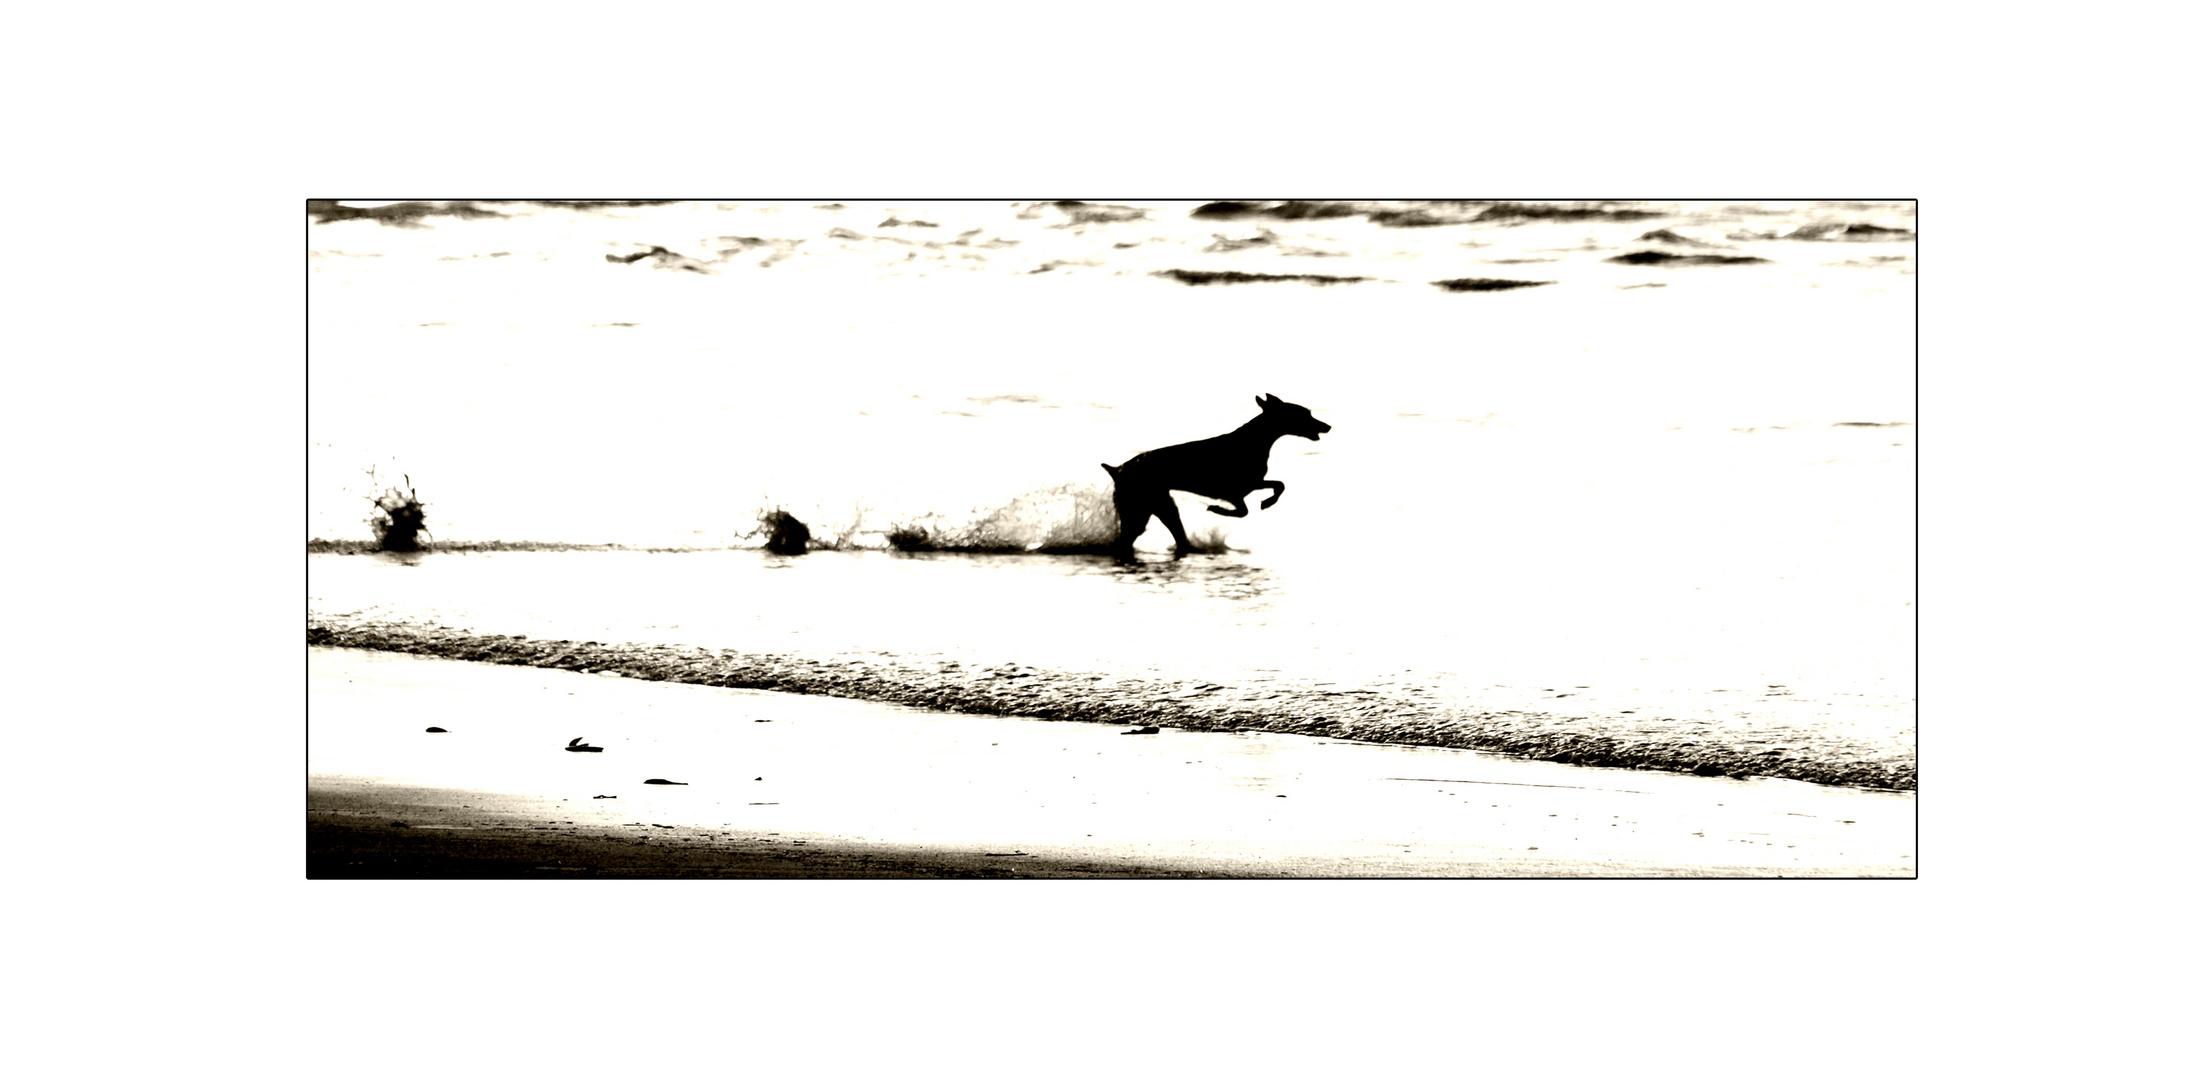 running in white waters